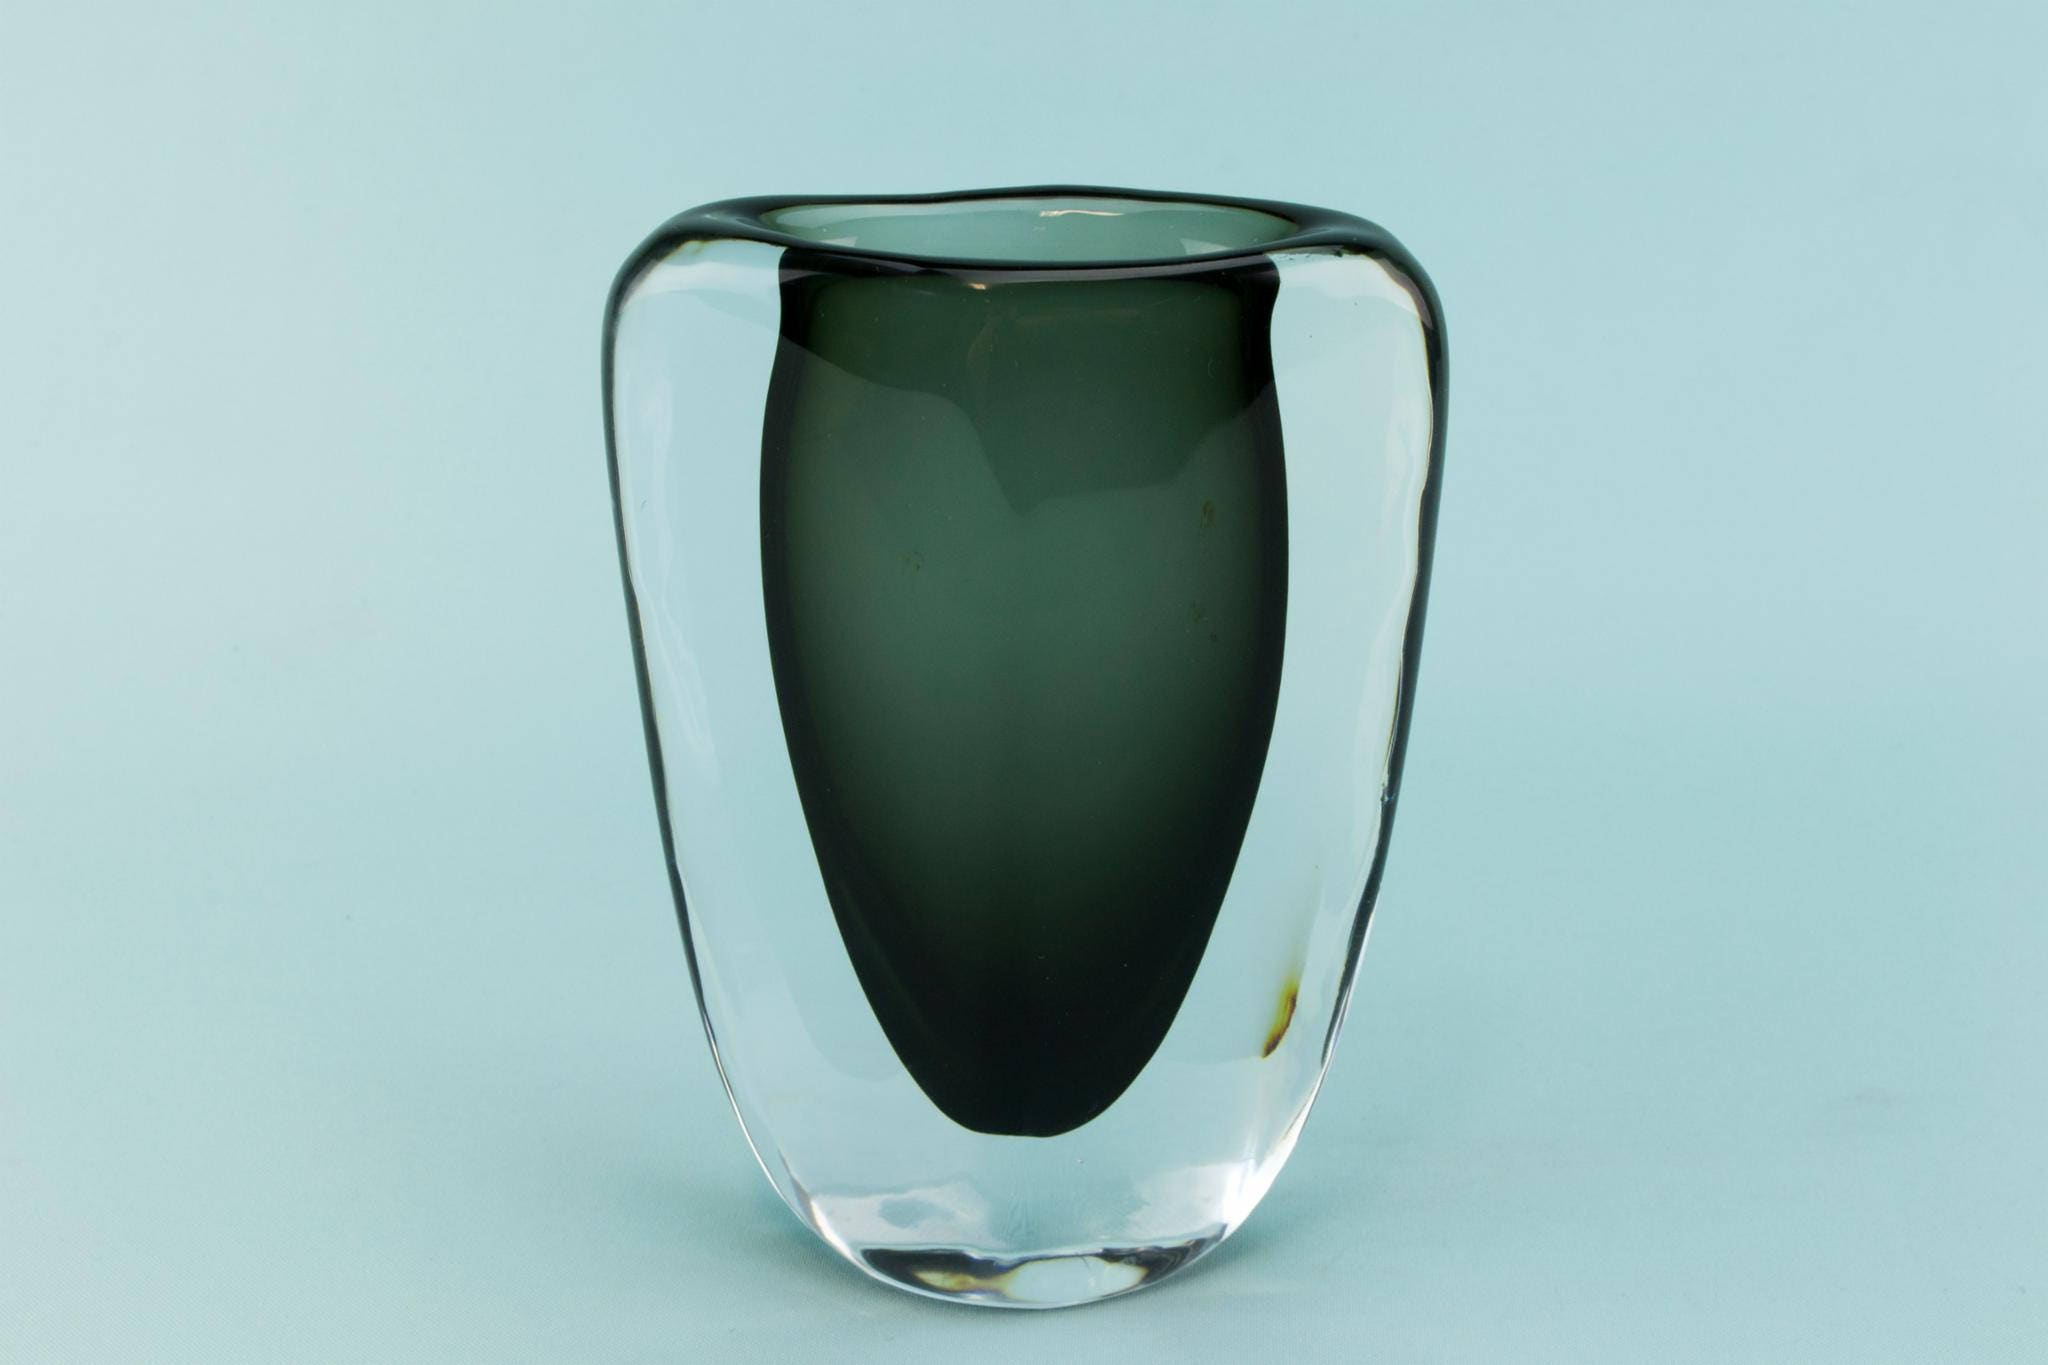 Small orrefors nils landberg glass vase smoky grey 1950s swedish small orrefors nils landberg glass vase smoky grey 1950s swedish mid century modern reviewsmspy